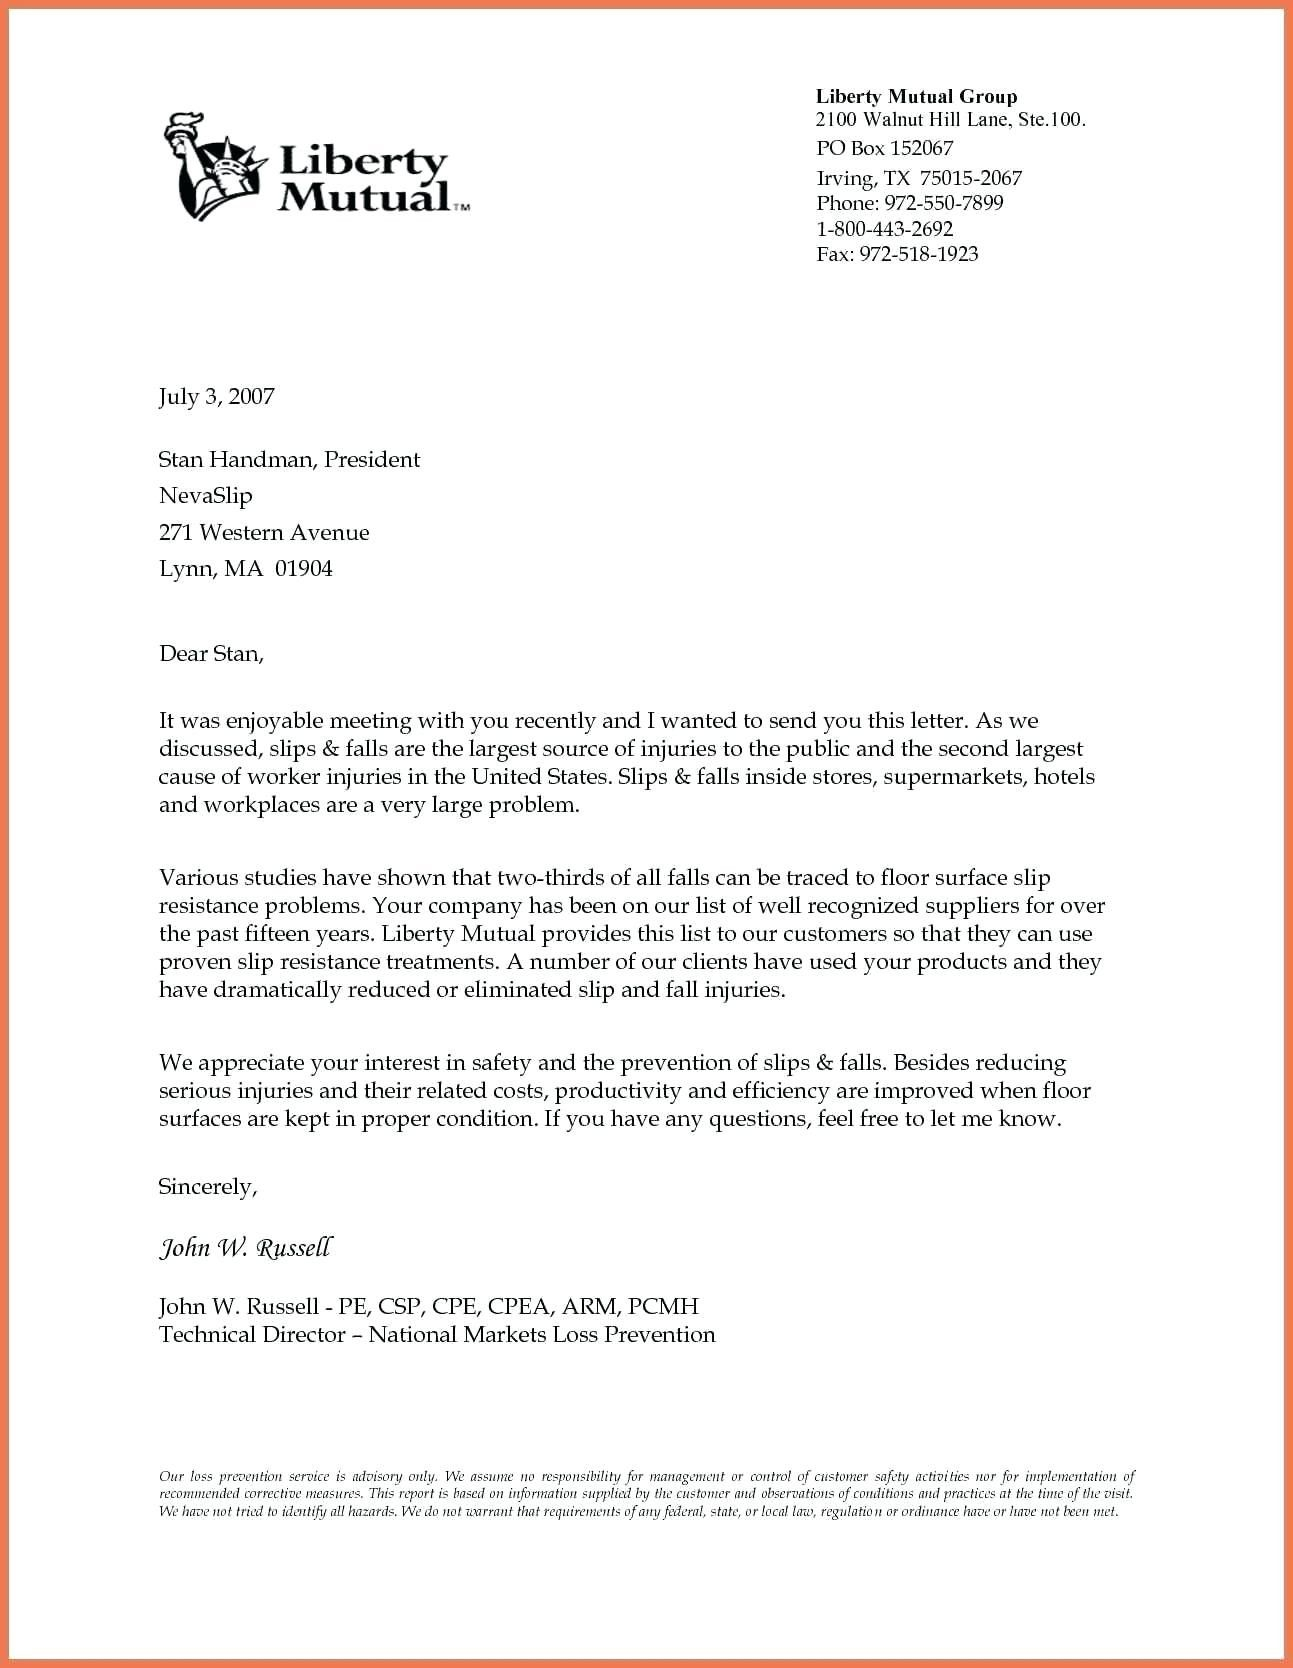 Formal Business Letter Templates 35 Formal Business